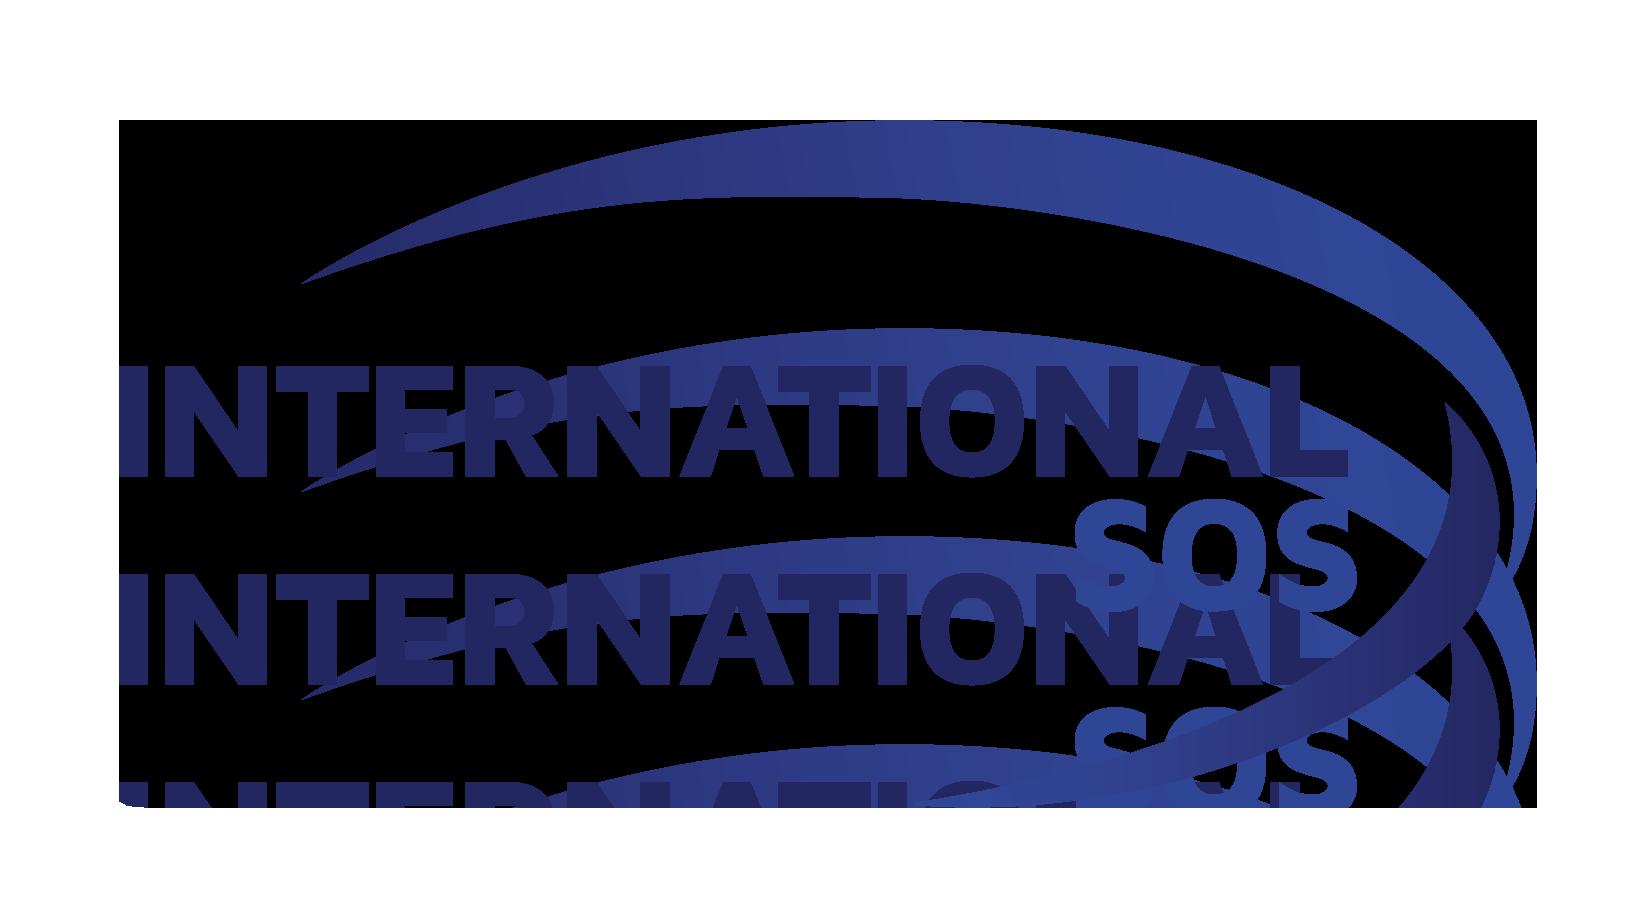 SOS Internanational